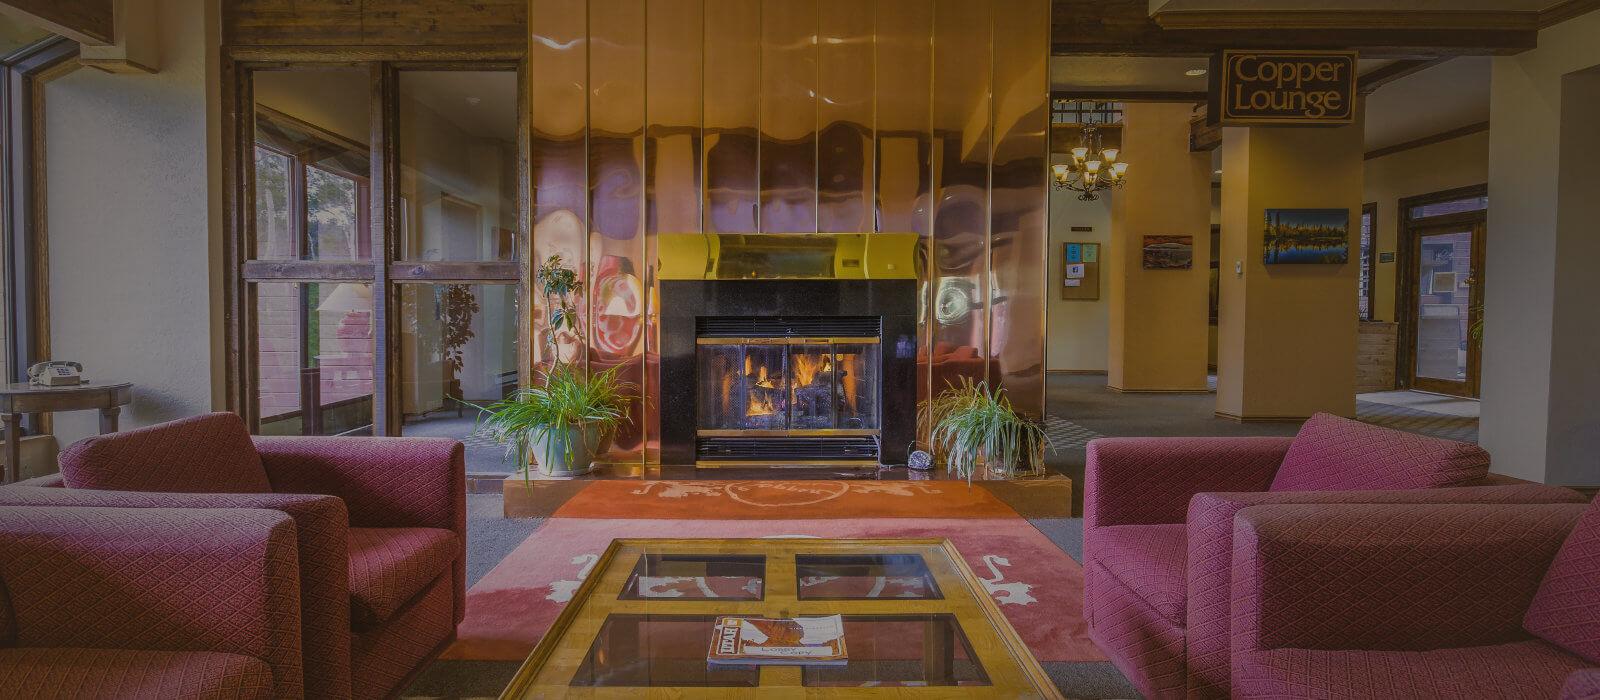 Copper Chase Condominiums image